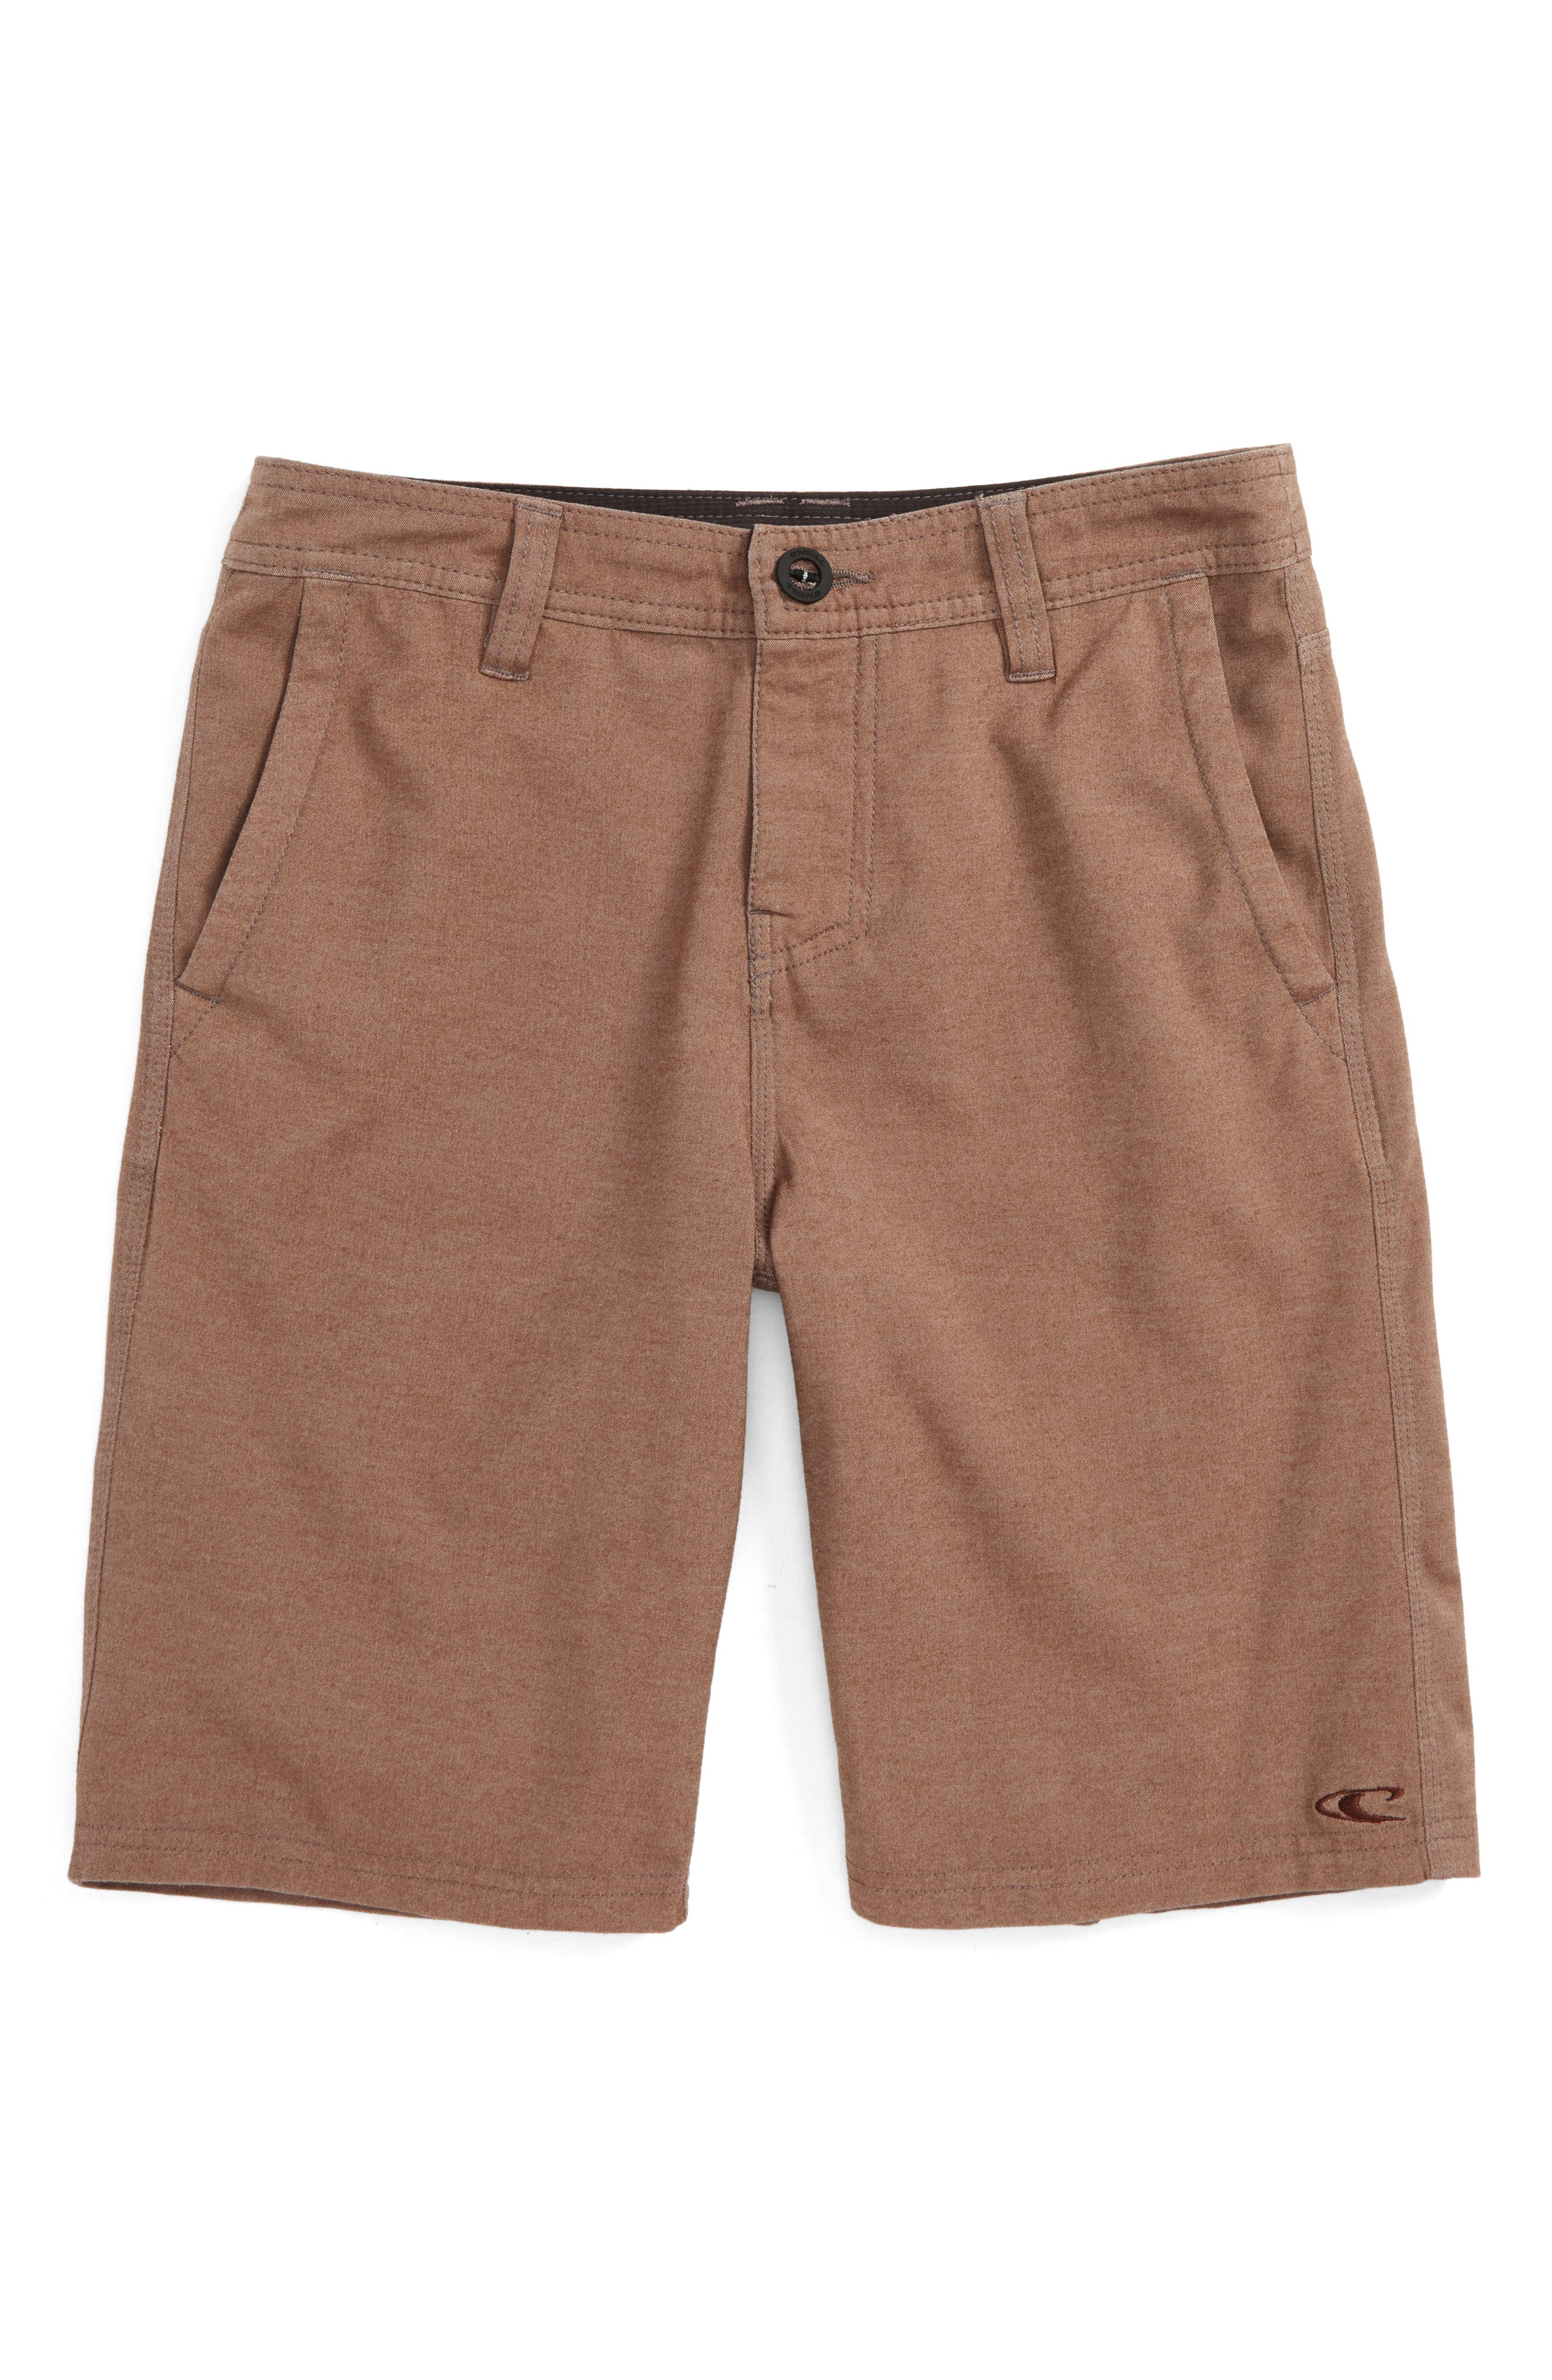 Locked Overdye Hybrid Shorts,                             Main thumbnail 1, color,                             216